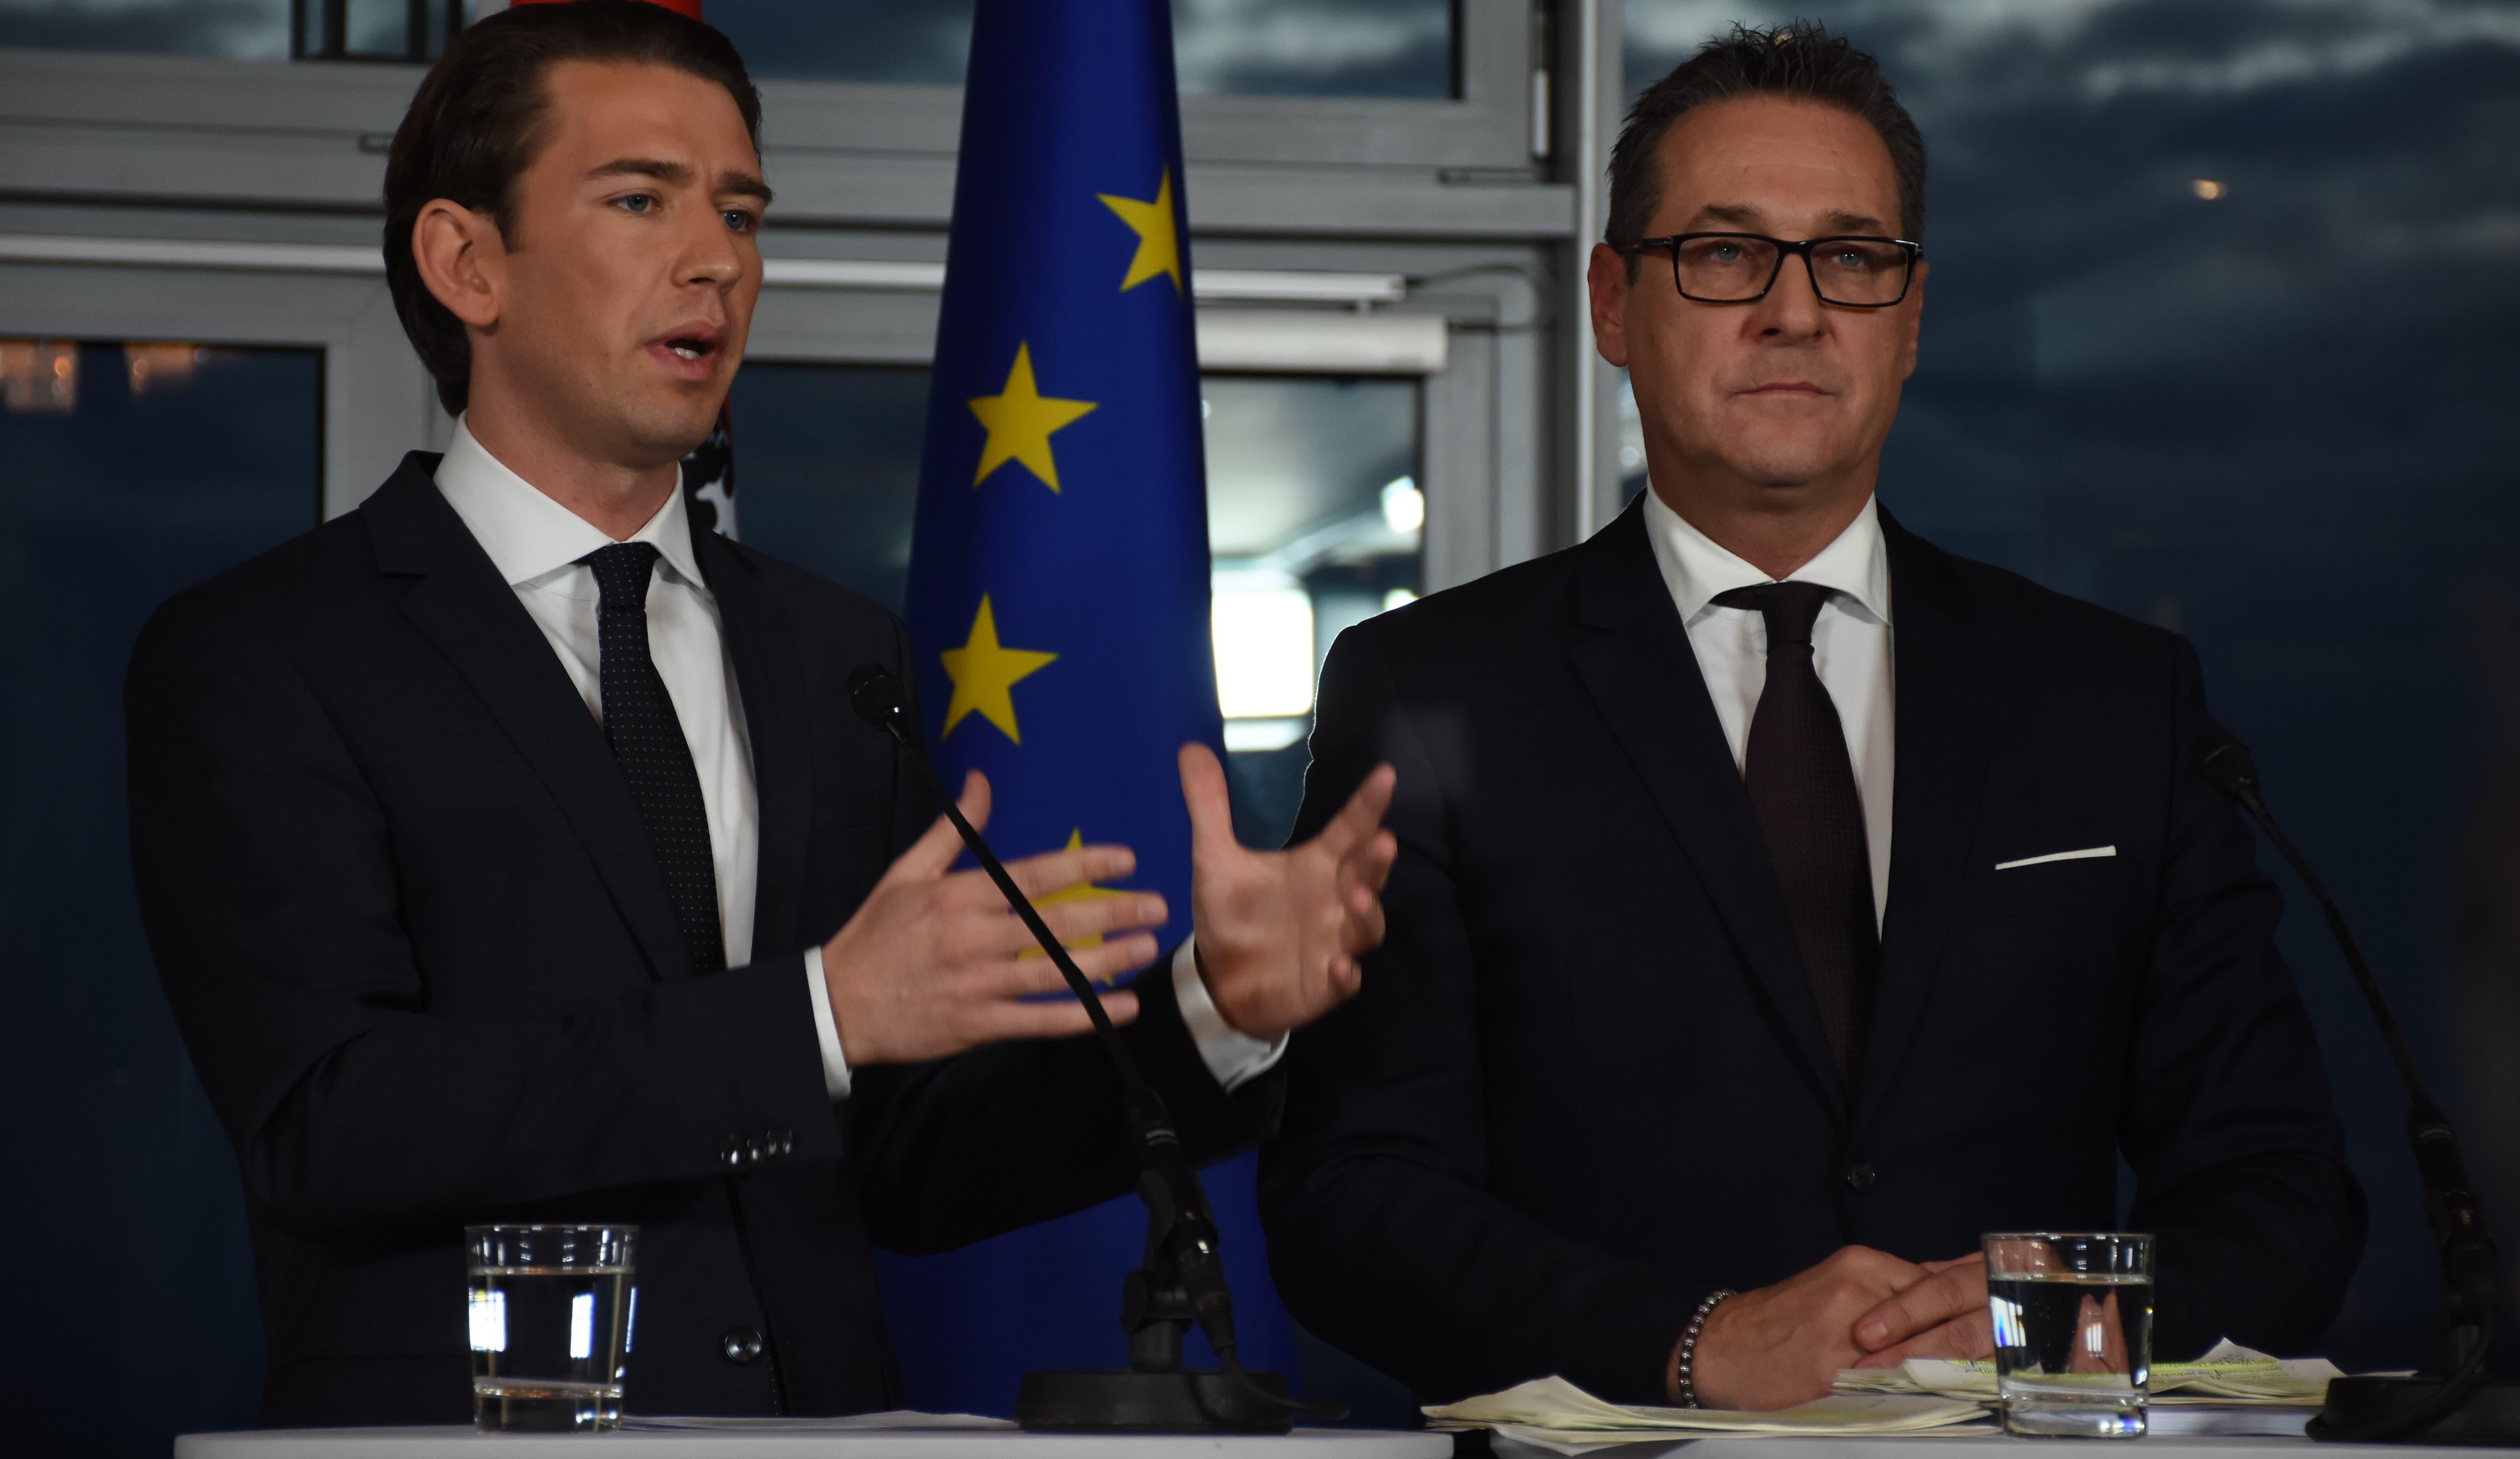 Austria's coalition partners Sebastian Kurz (left) and Heinz-Christian Strache (Photo: Askin Kiyagan/Getty)